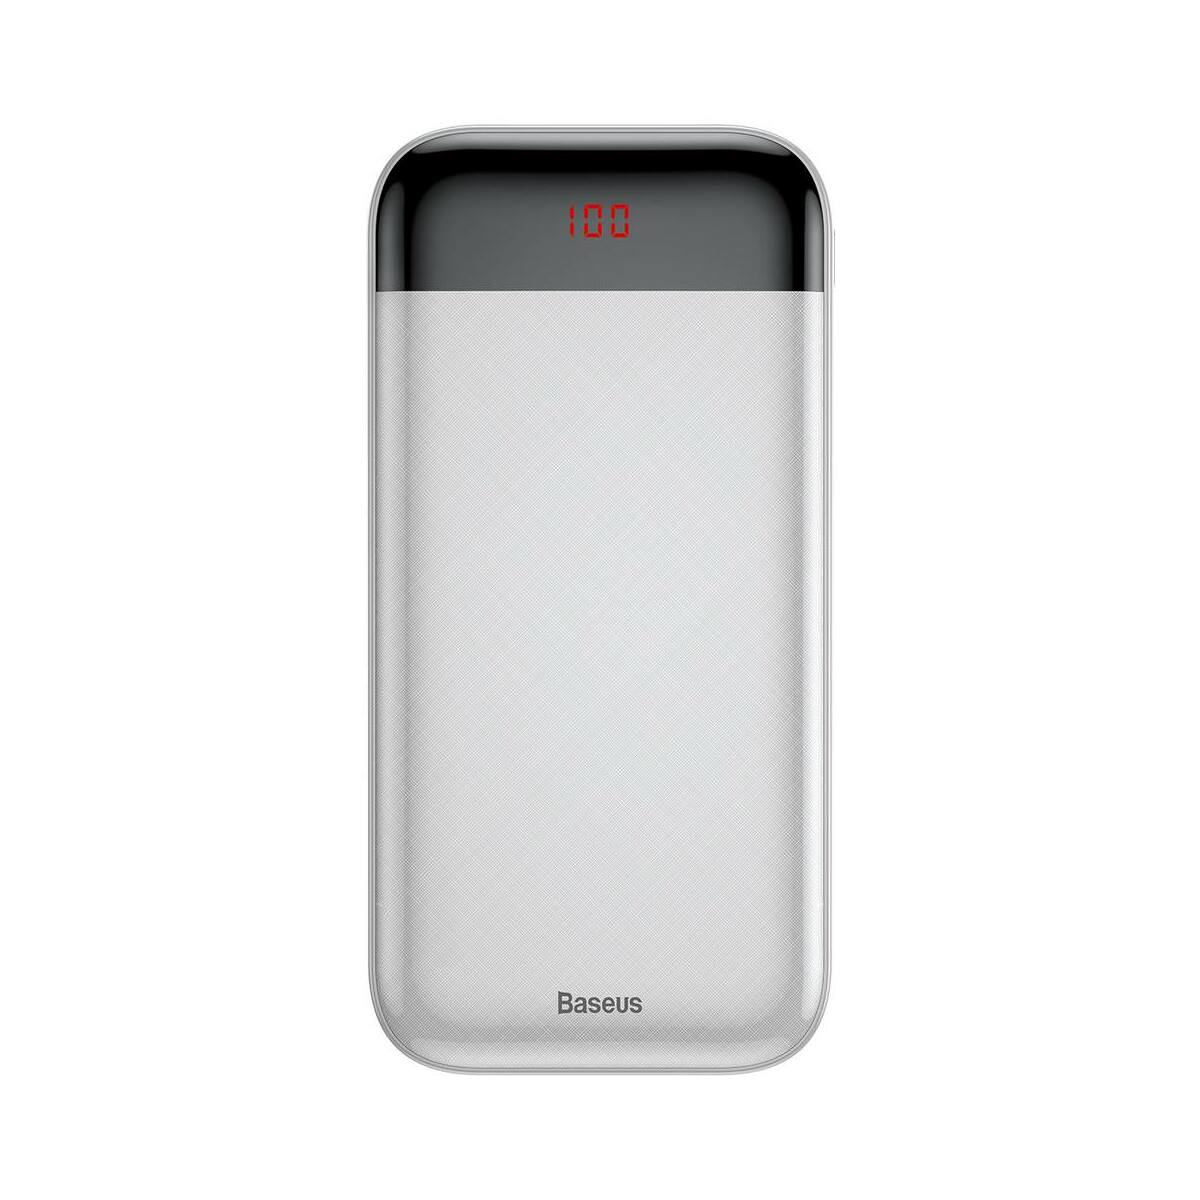 Baseus Power Bank Mini Cu, digitális kijelző (Micro USB bemenet / dupla USB kimenet), 3A, 20.000 mAh, fehér (PPALL-CKU02)